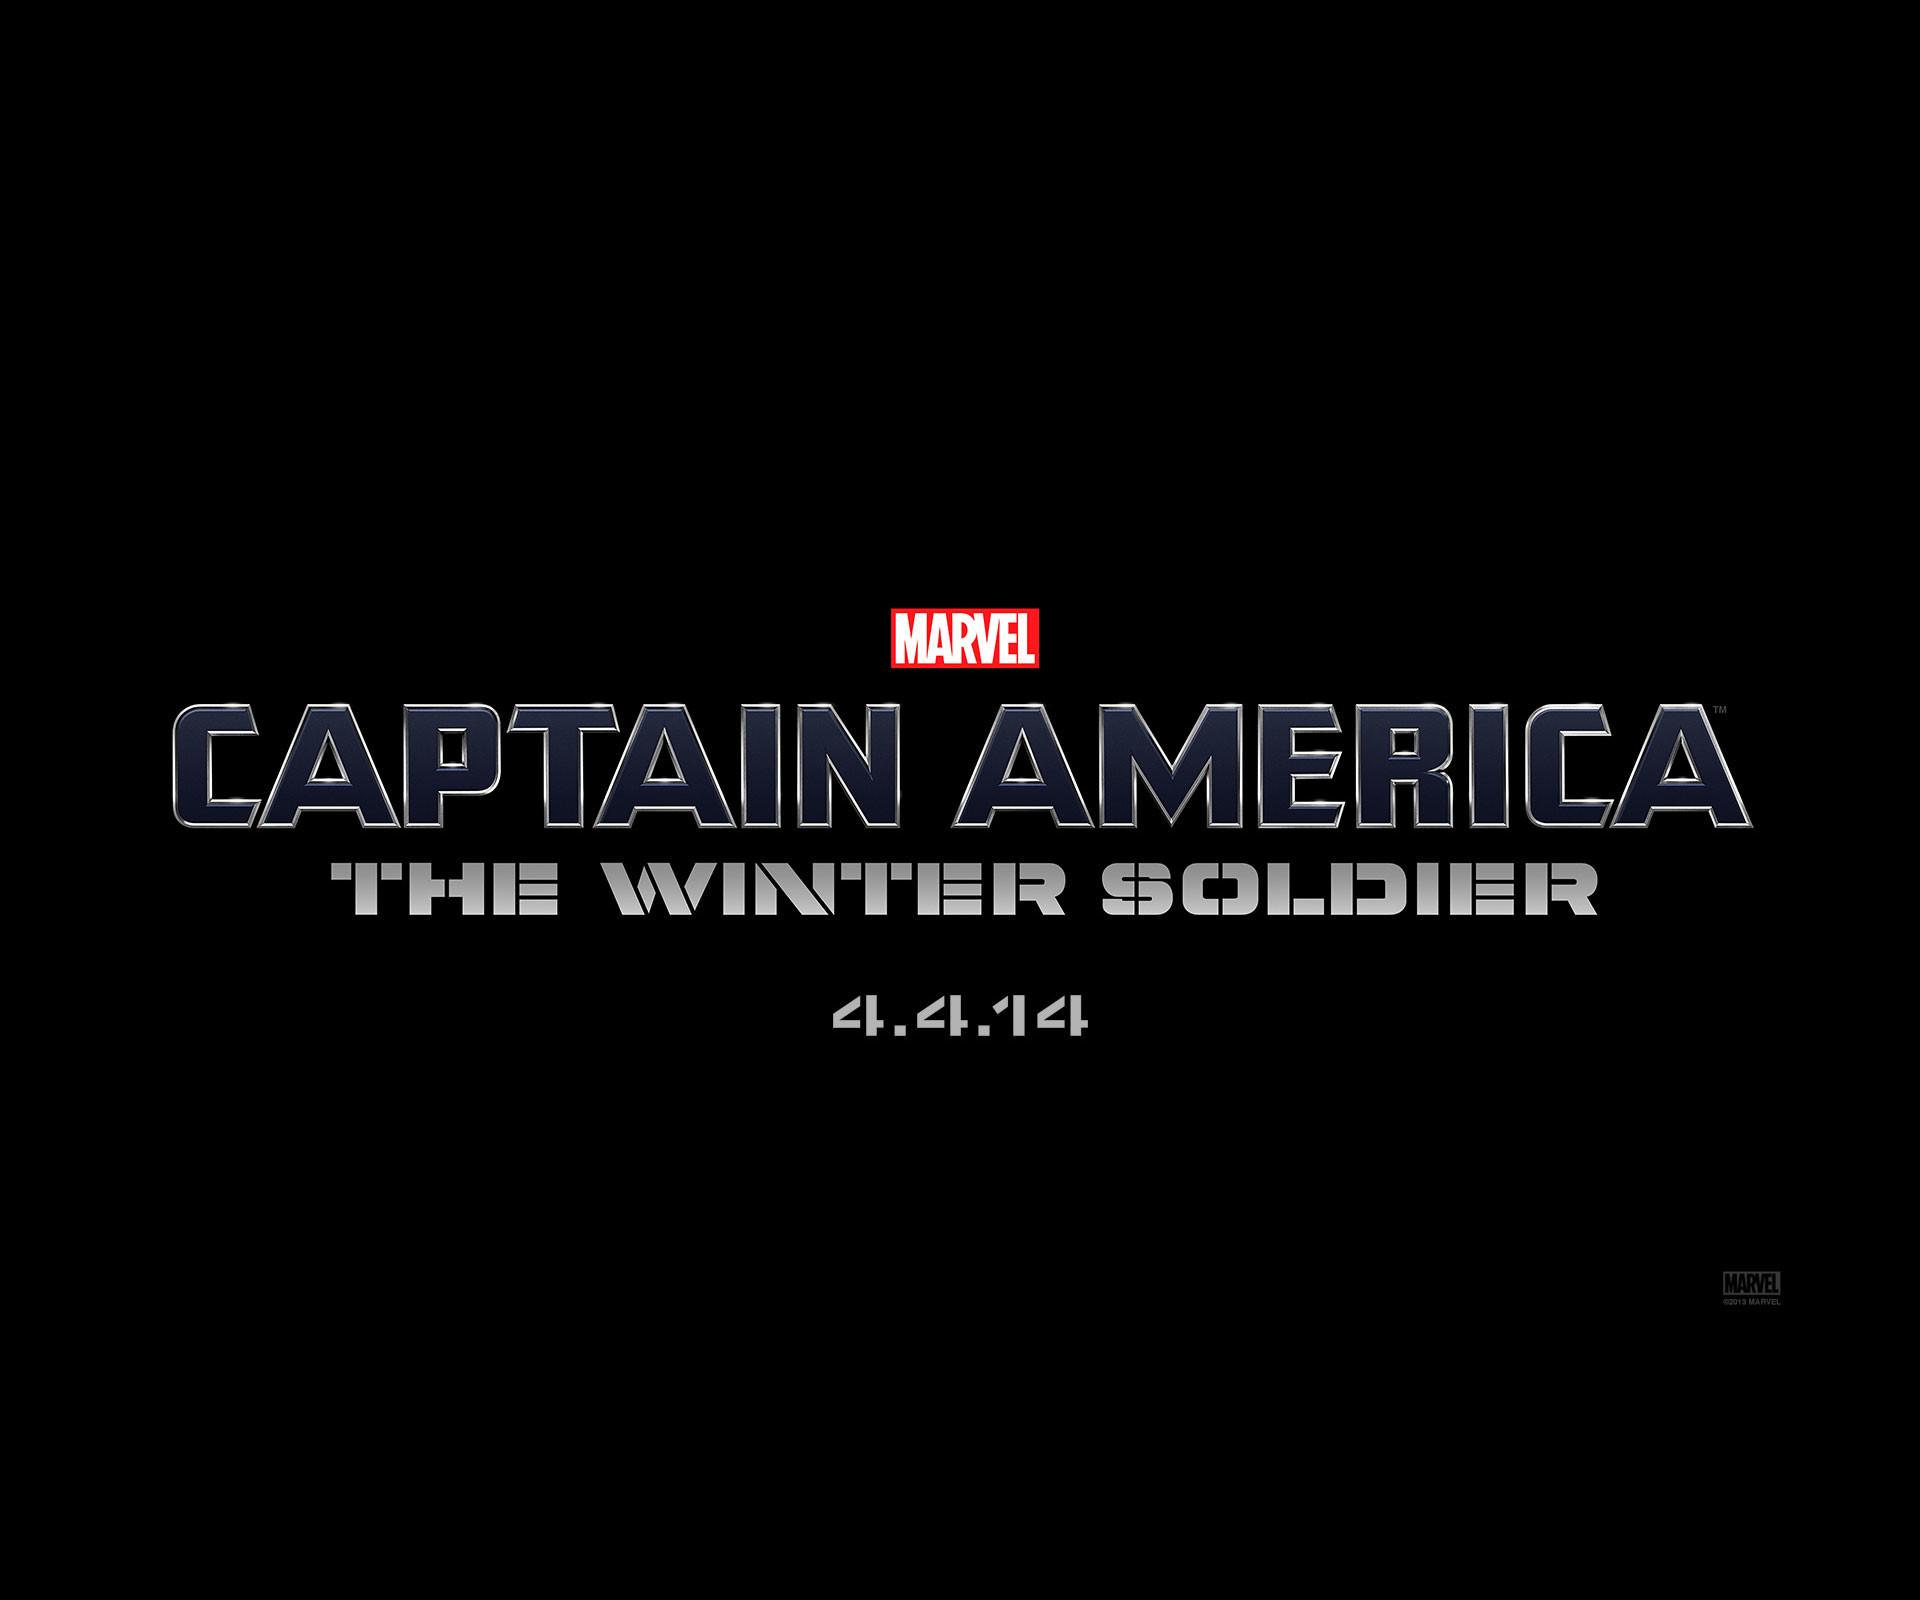 Captain America The Winter Soldier Logo Wallpaper